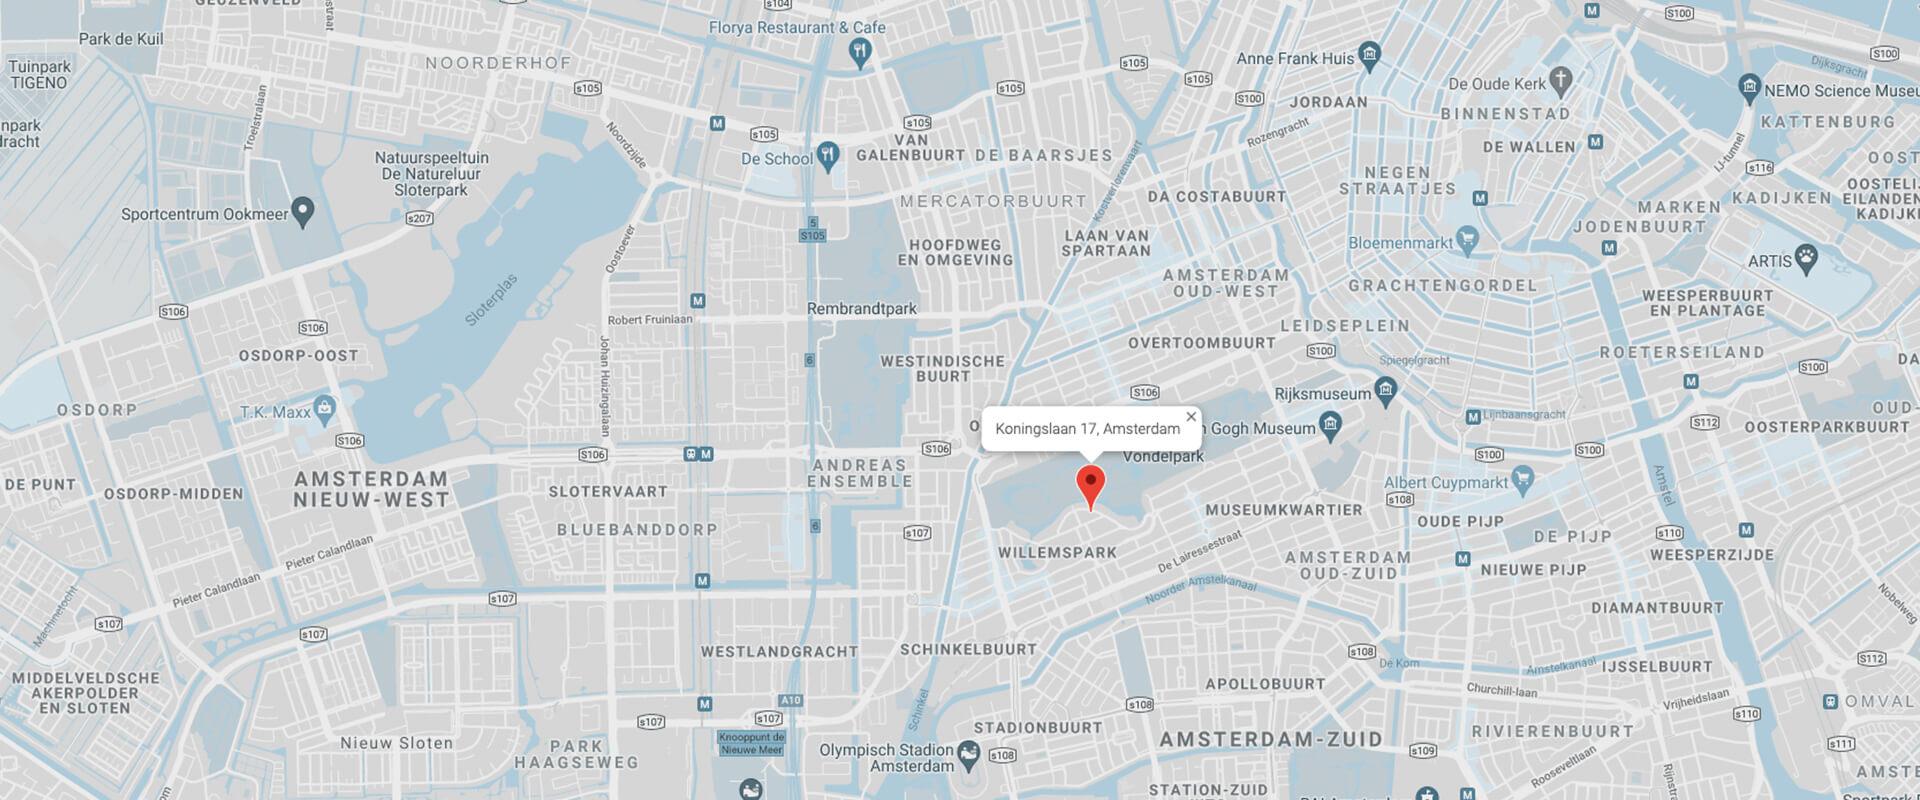 Viotta Law - Map Address